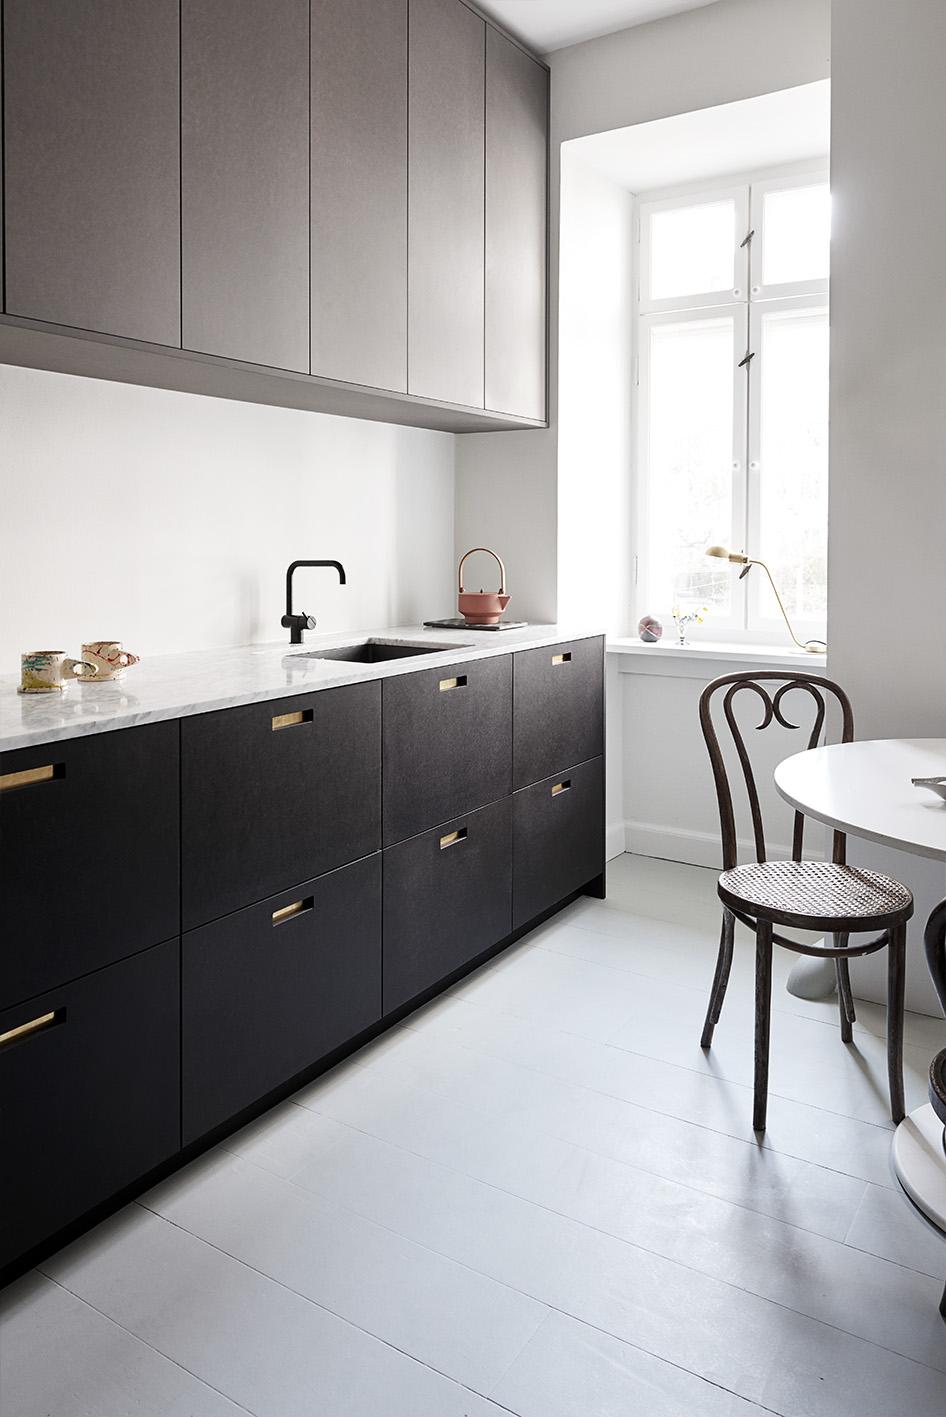 &SHUFL-køkken-fronter-ikea-lkitchen-ikeahack-designerkitchen-andshufl-fronts-skuffer-skabe-låger-til-ikea-koekken-raw-sortelåger-marmorbordplade-galleri3